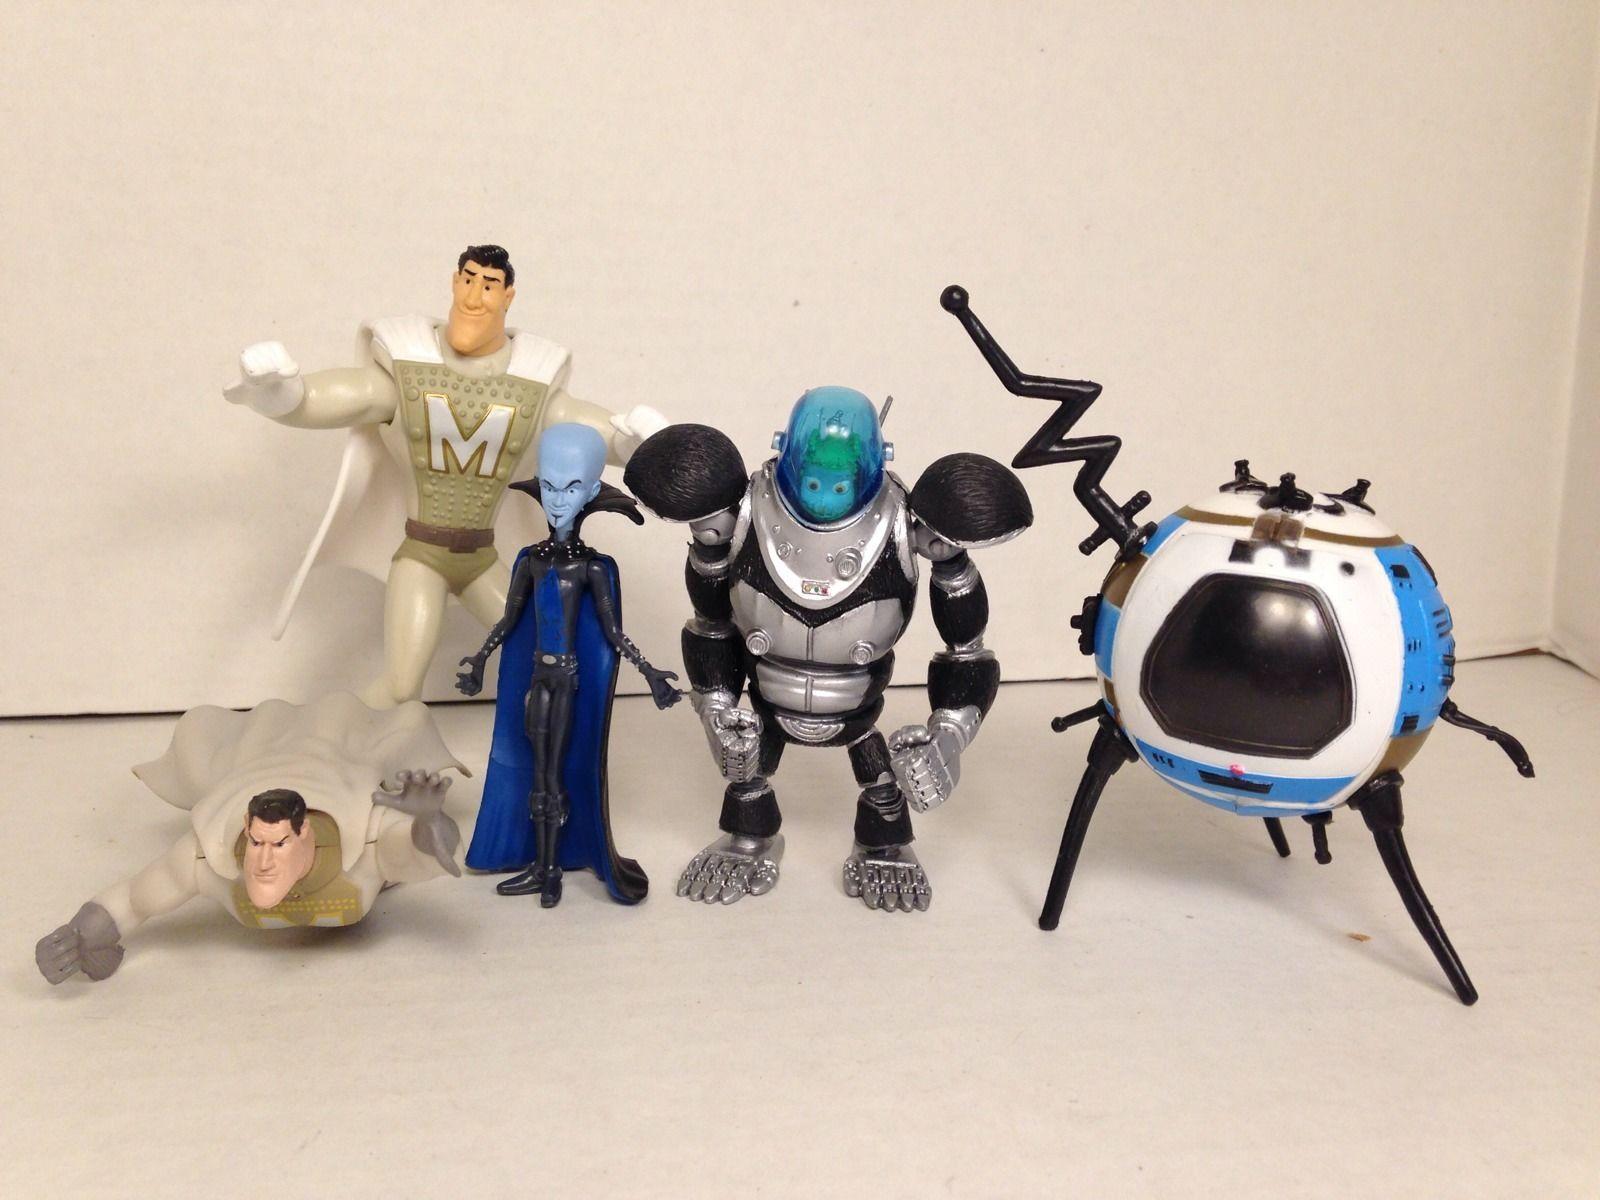 Megamind toys